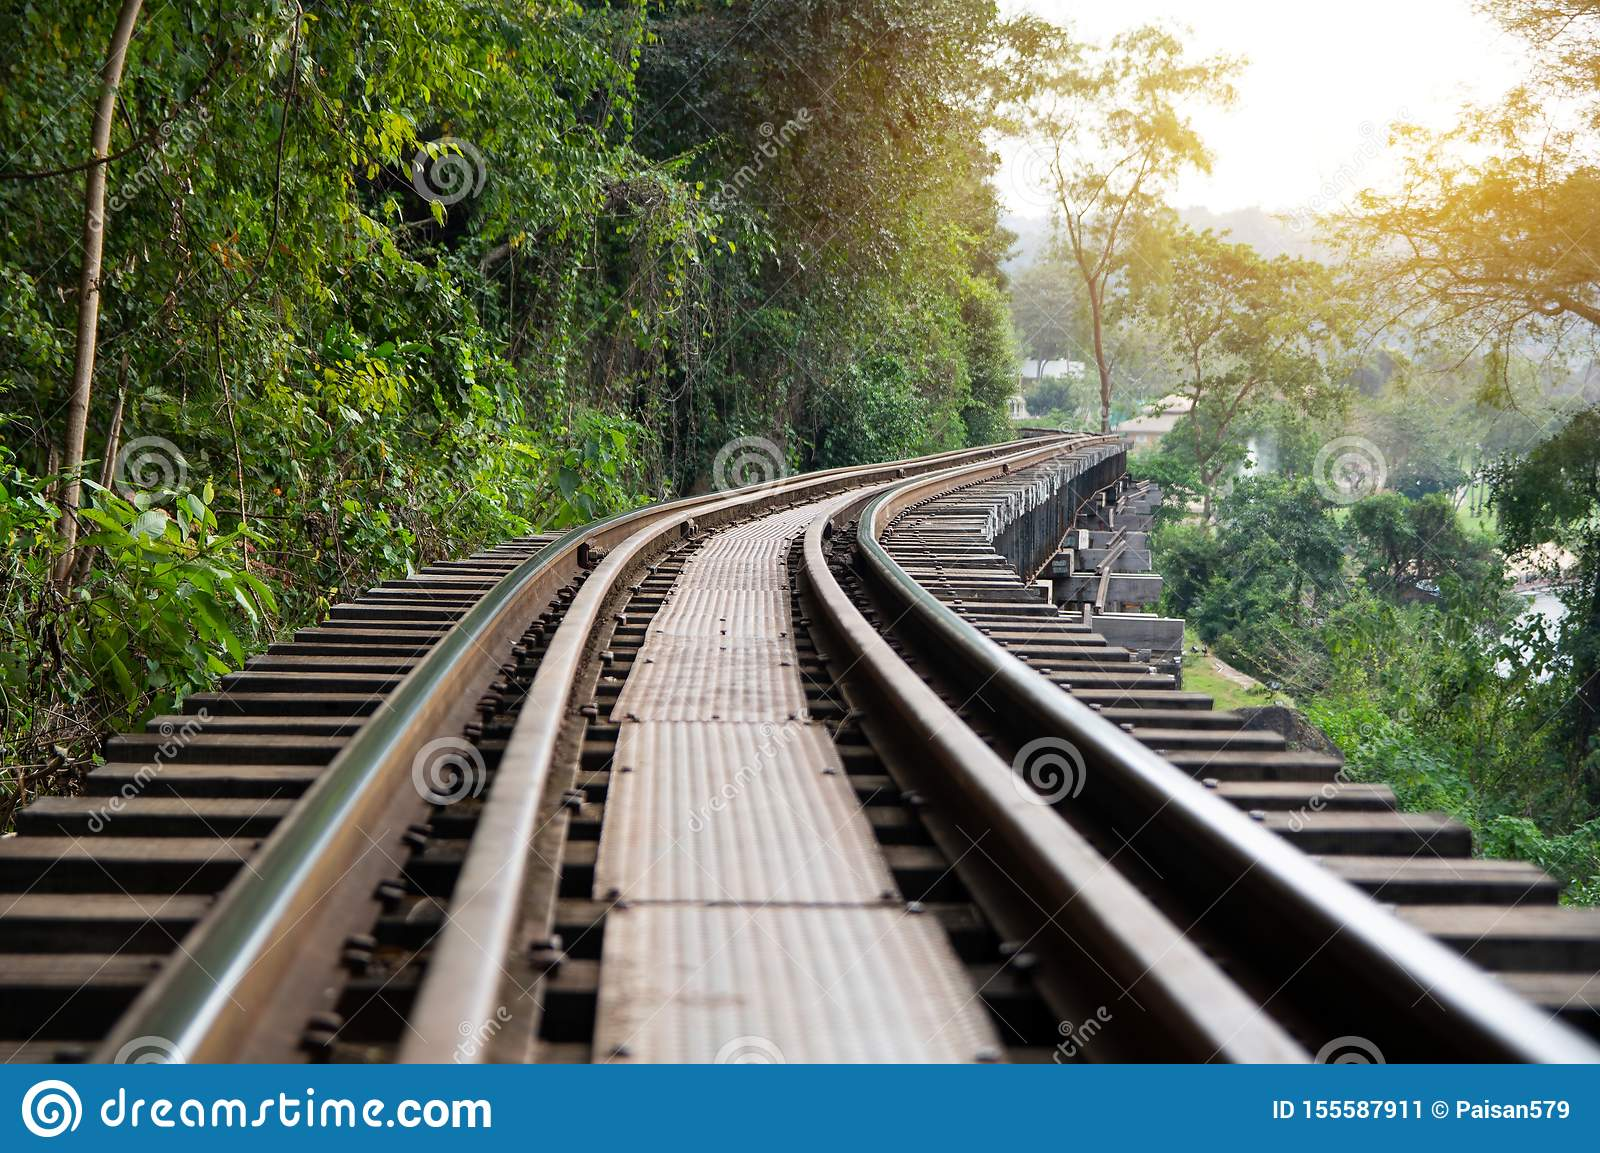 Ferrocarril de la muerte construido durante la Segunda Guerra Mundial, Kanchanaburi Tailandia